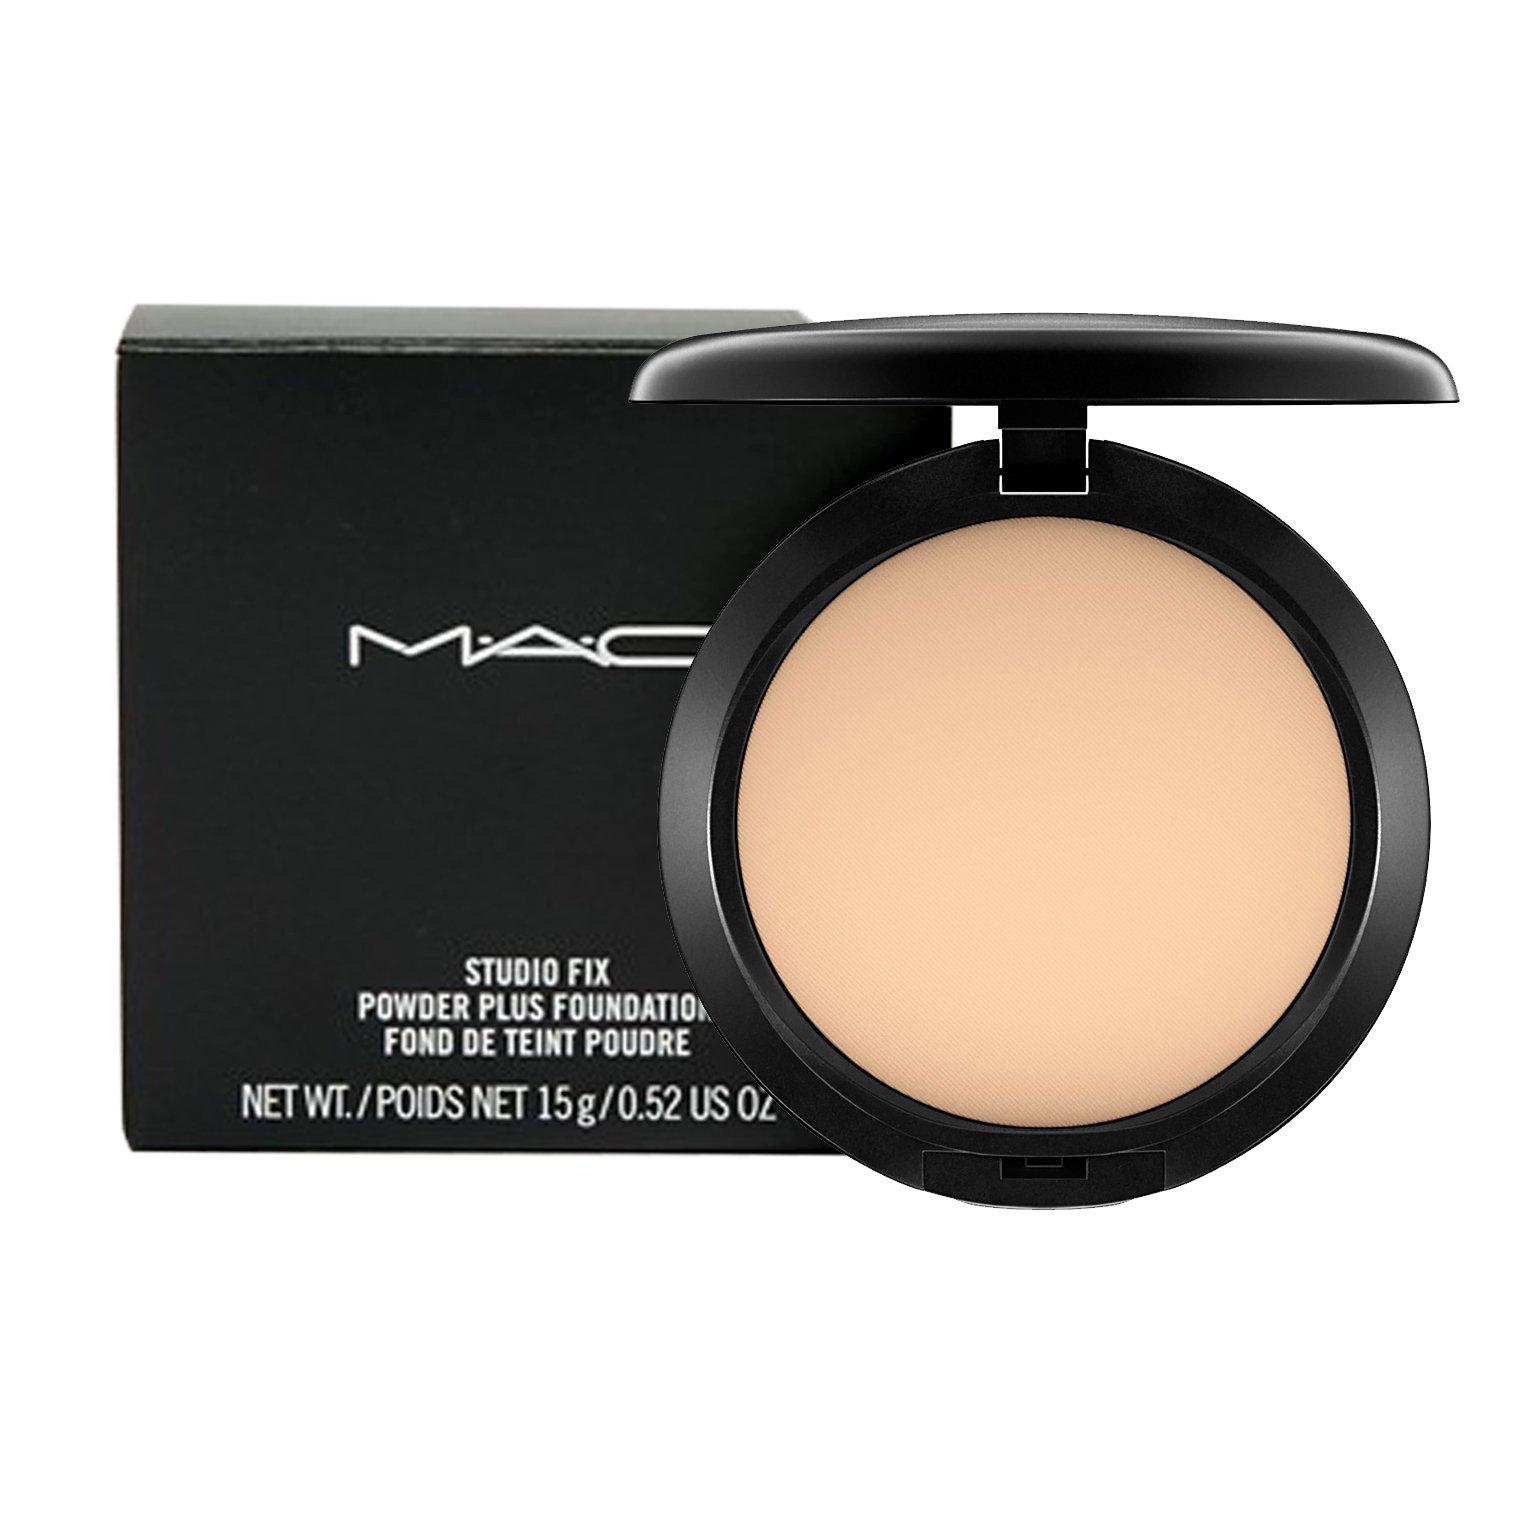 phan-nen-phu-mac-studio-fix-powder-plus-foundation-15g